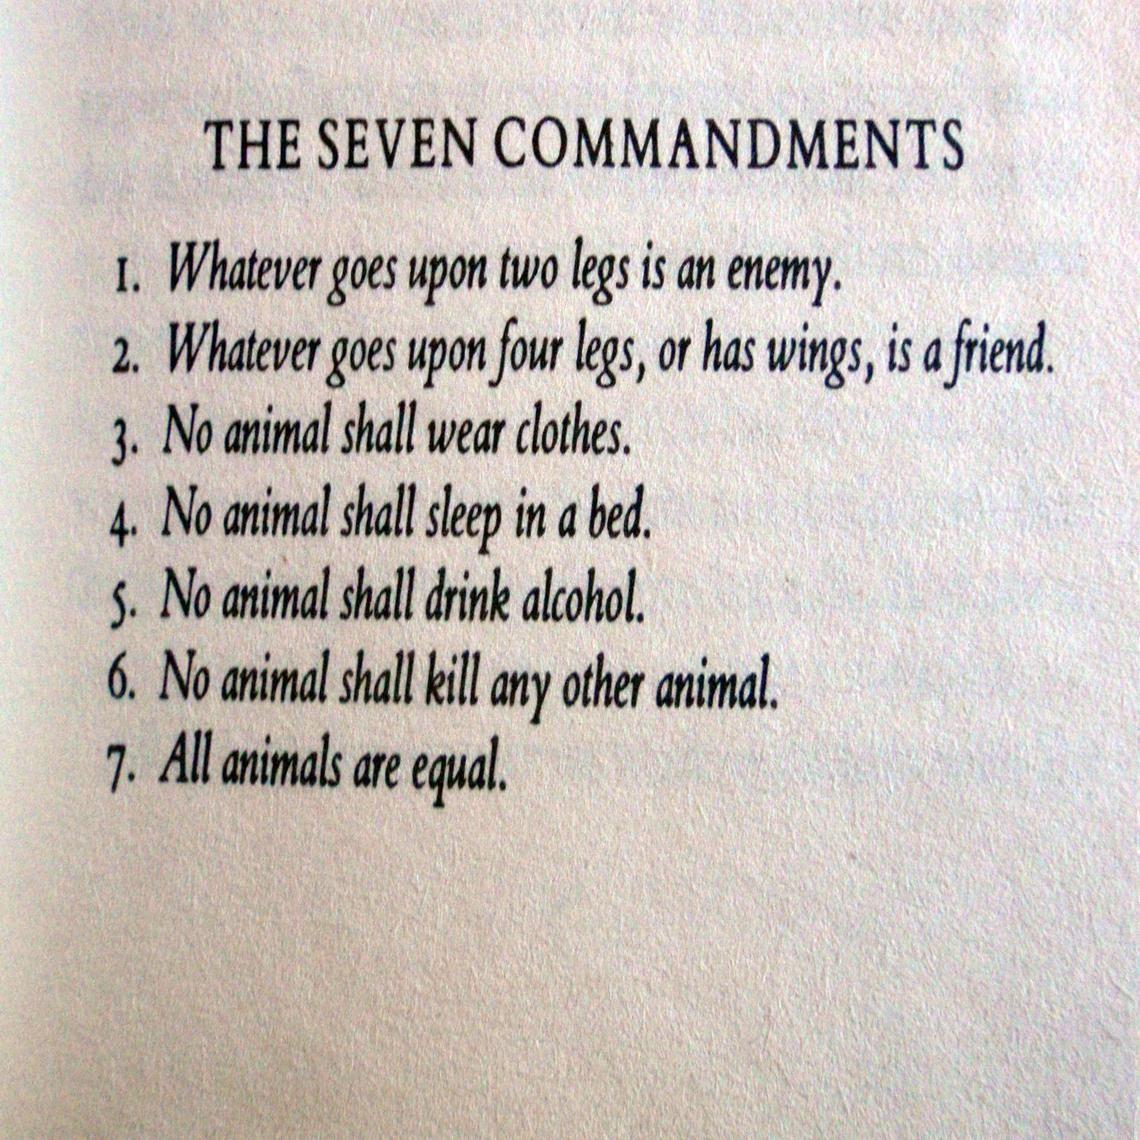 George Orwell S Animal Farm The 7 Commandments Wallpaper Pinterest